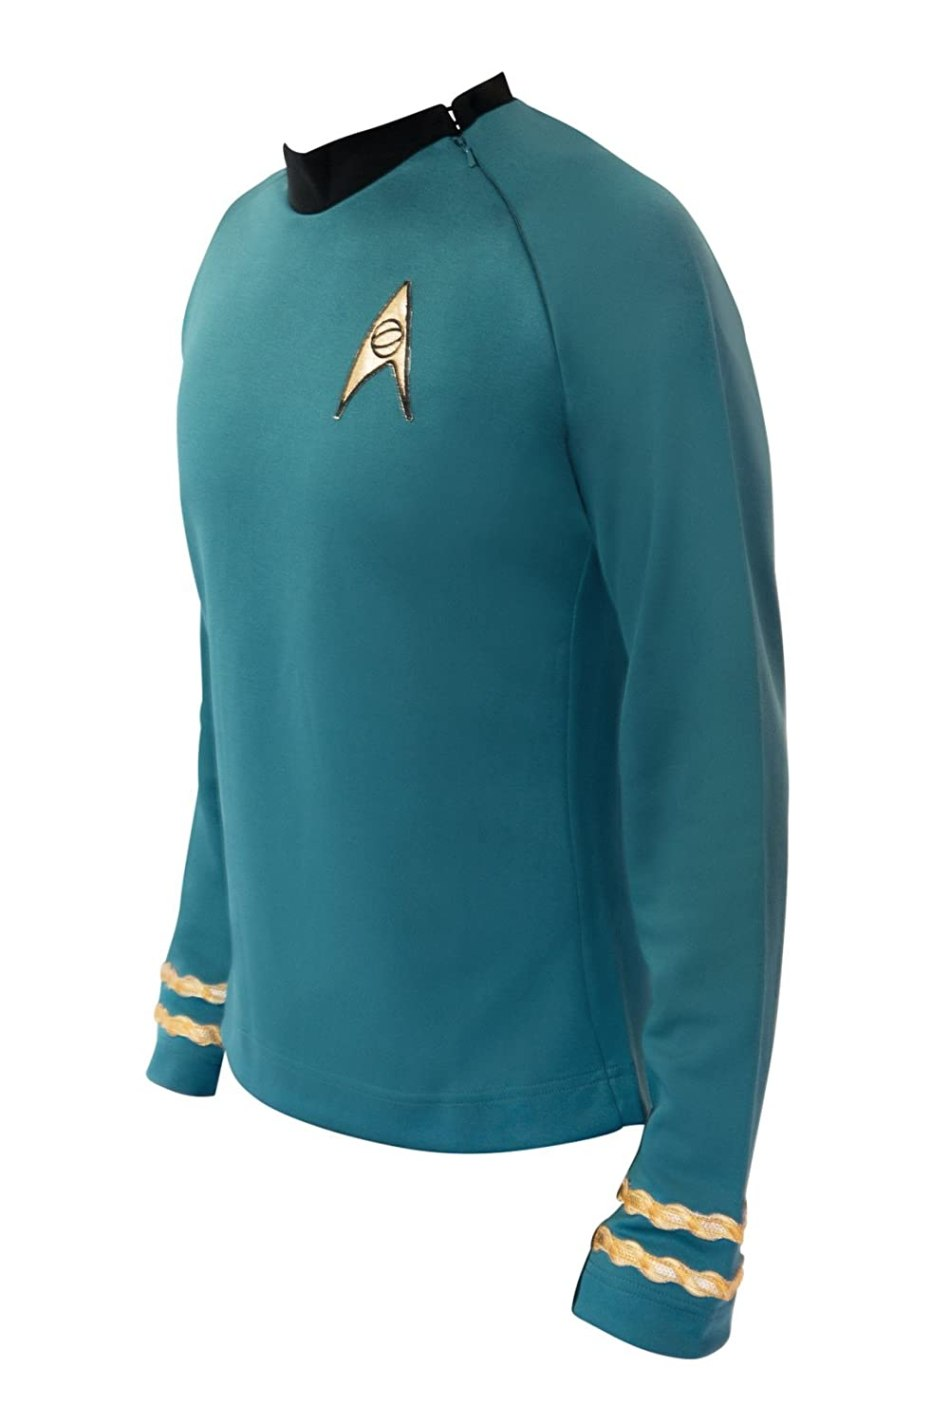 Star Trek Costume Spock TOS Uniform Classic Original Series Shirt